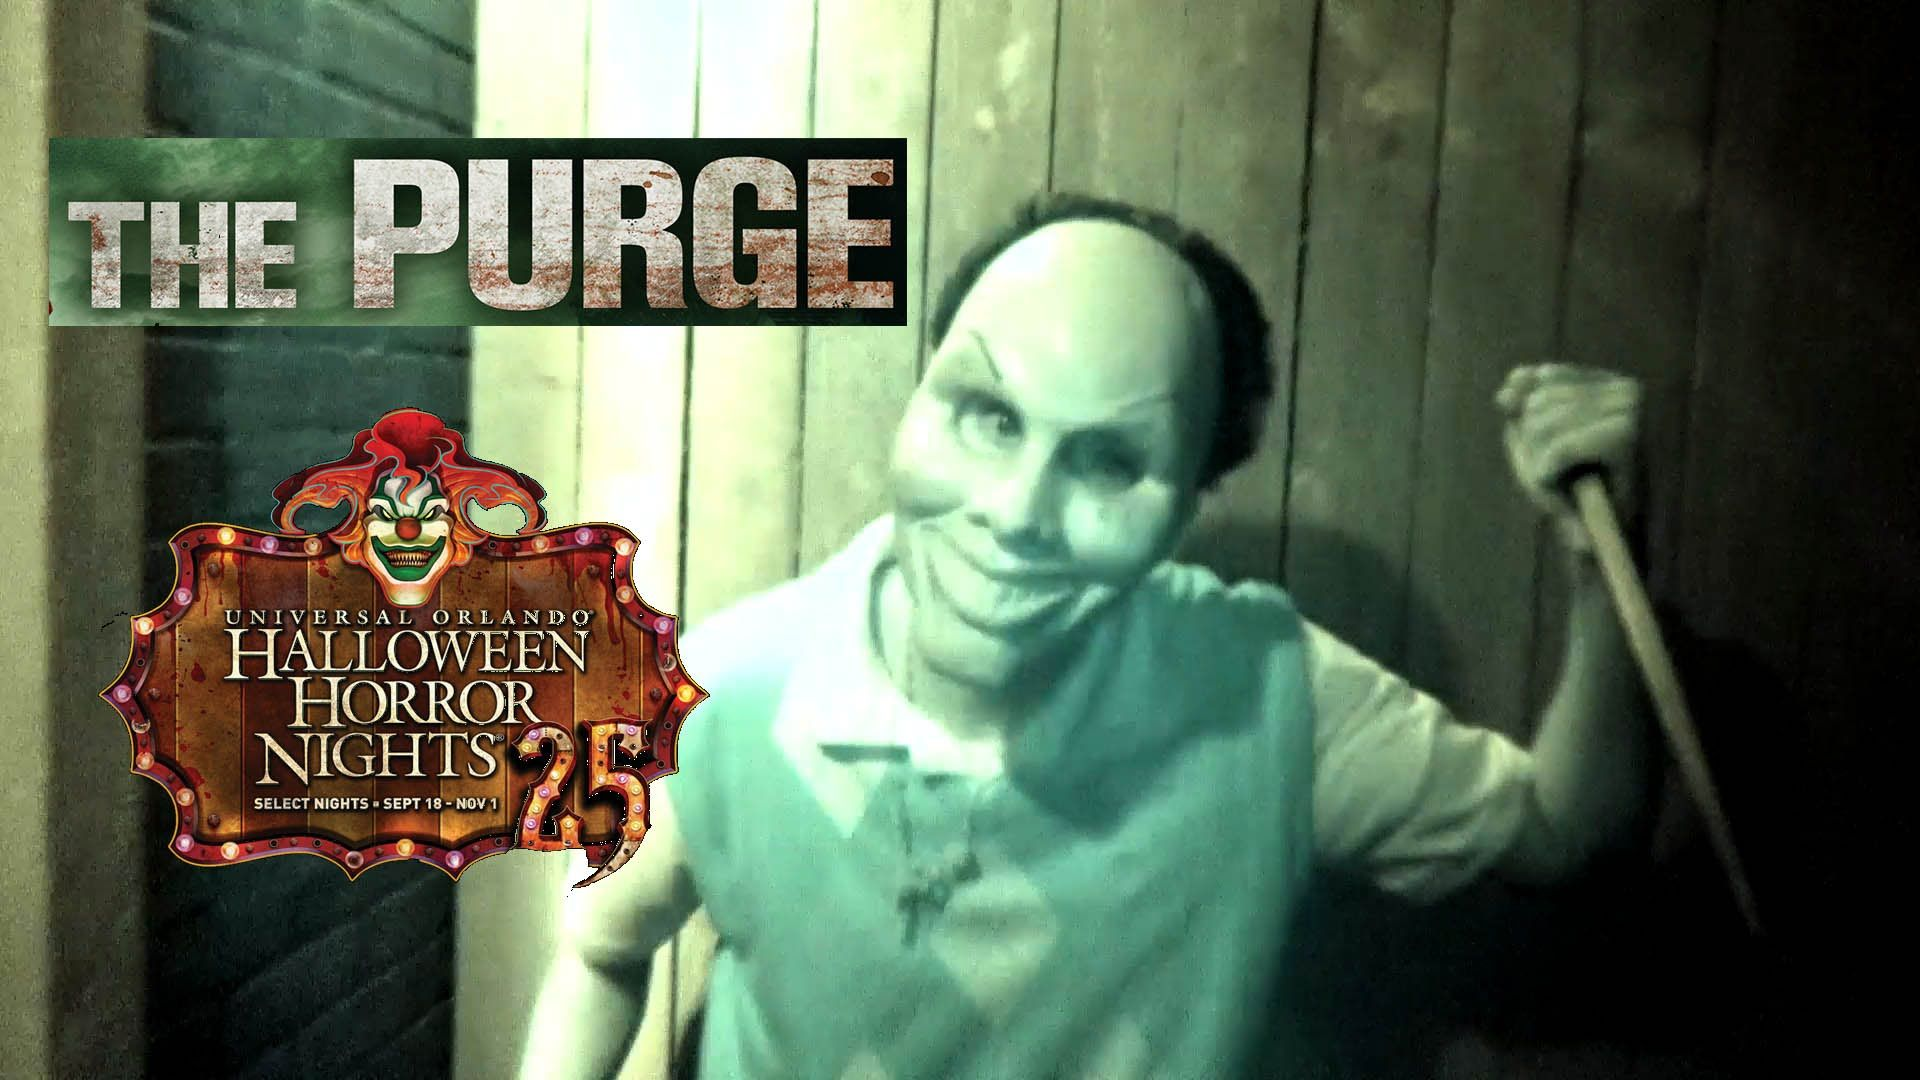 the purge haunted house maze walk through halloween horror nights